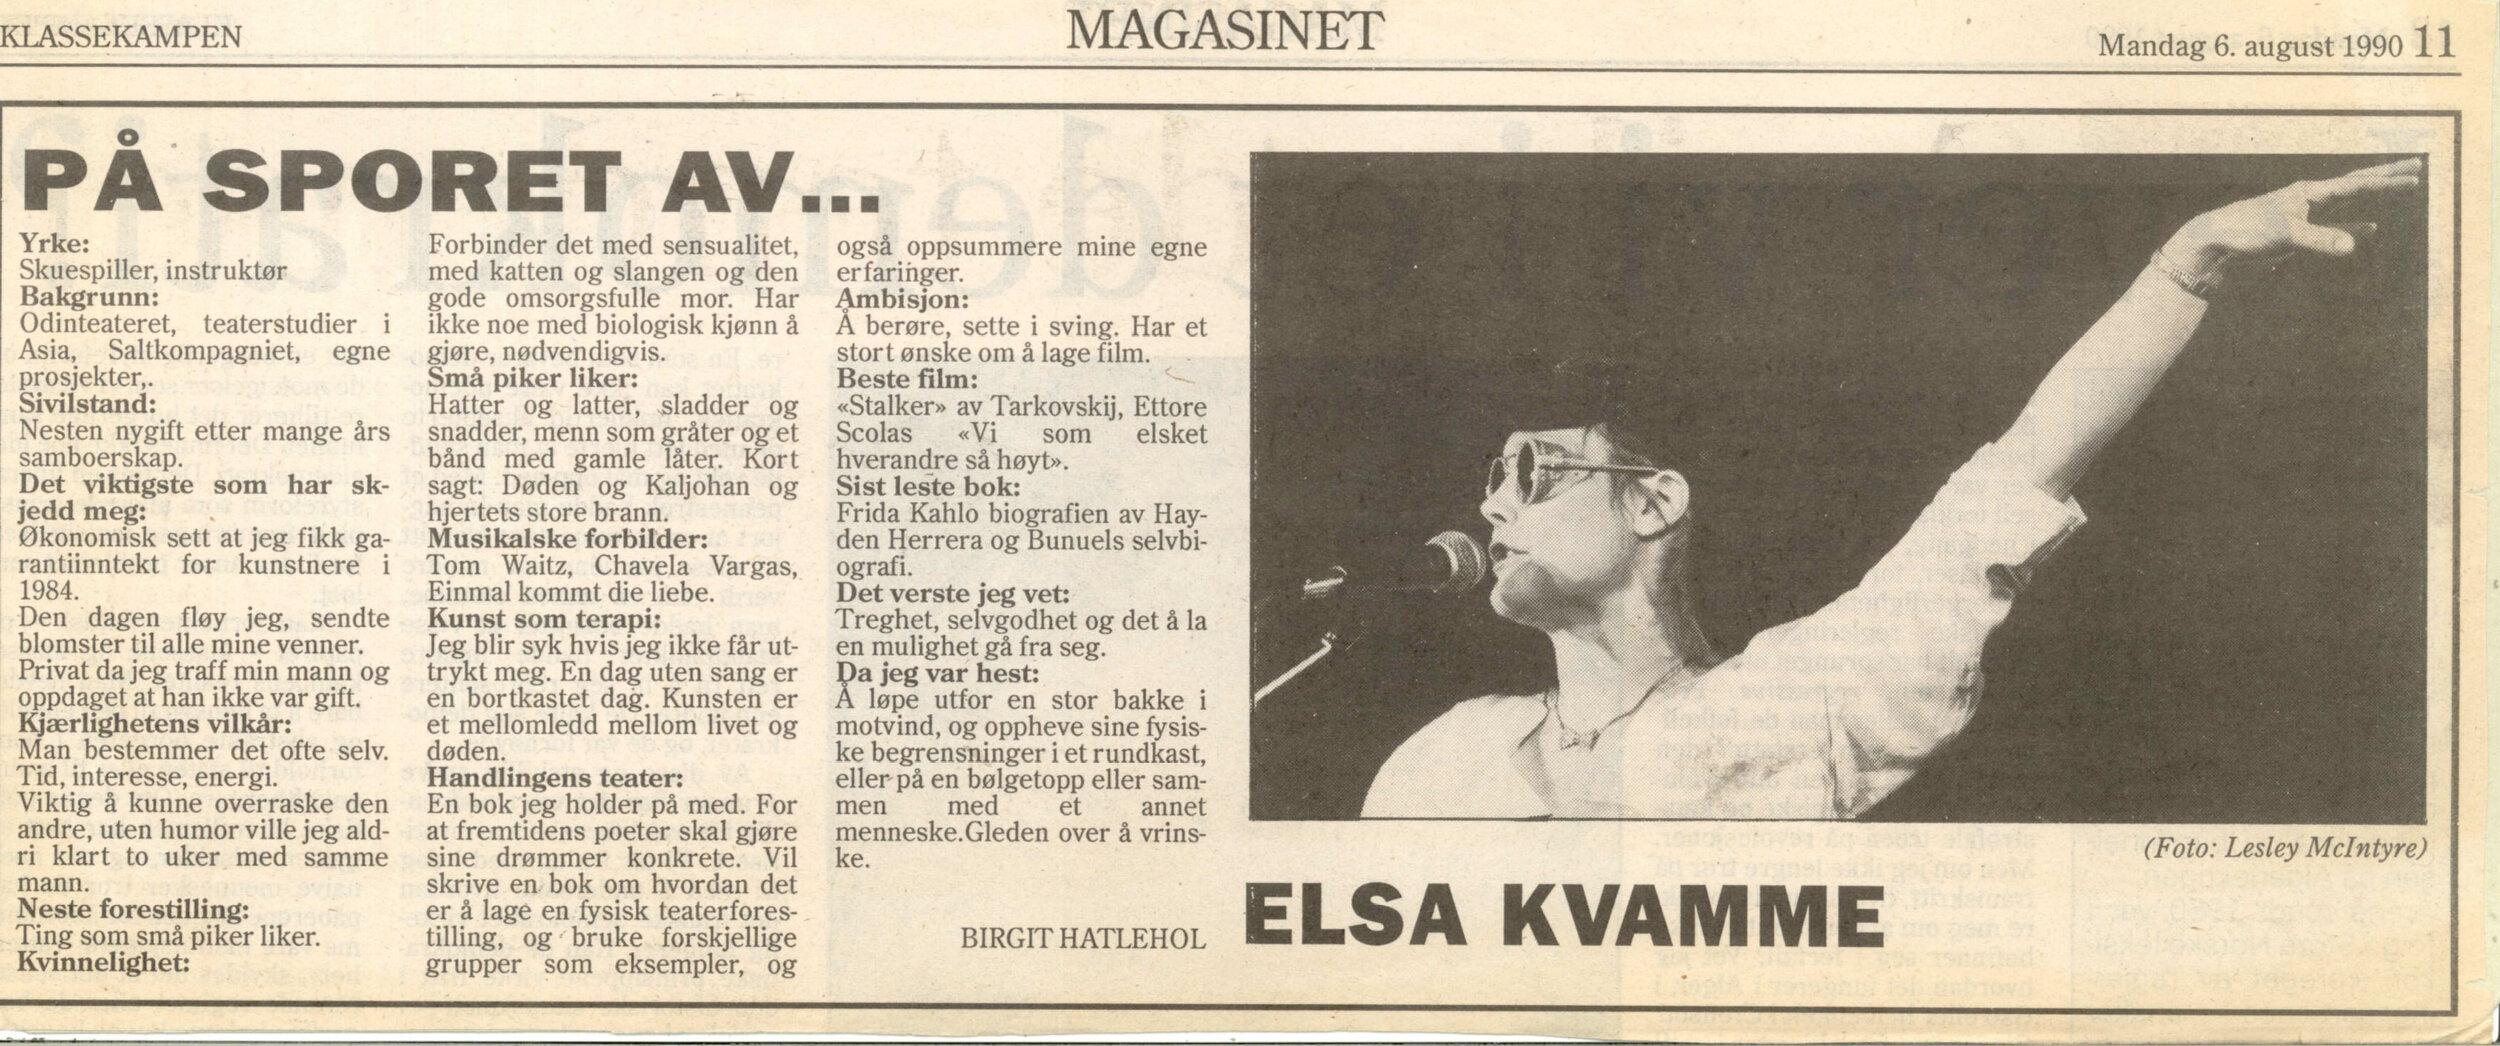 forhåndsomtale_ting som små piker liker_elsa kvamme_klassekampen 06081990_tekst birgit hatlehol.jpg